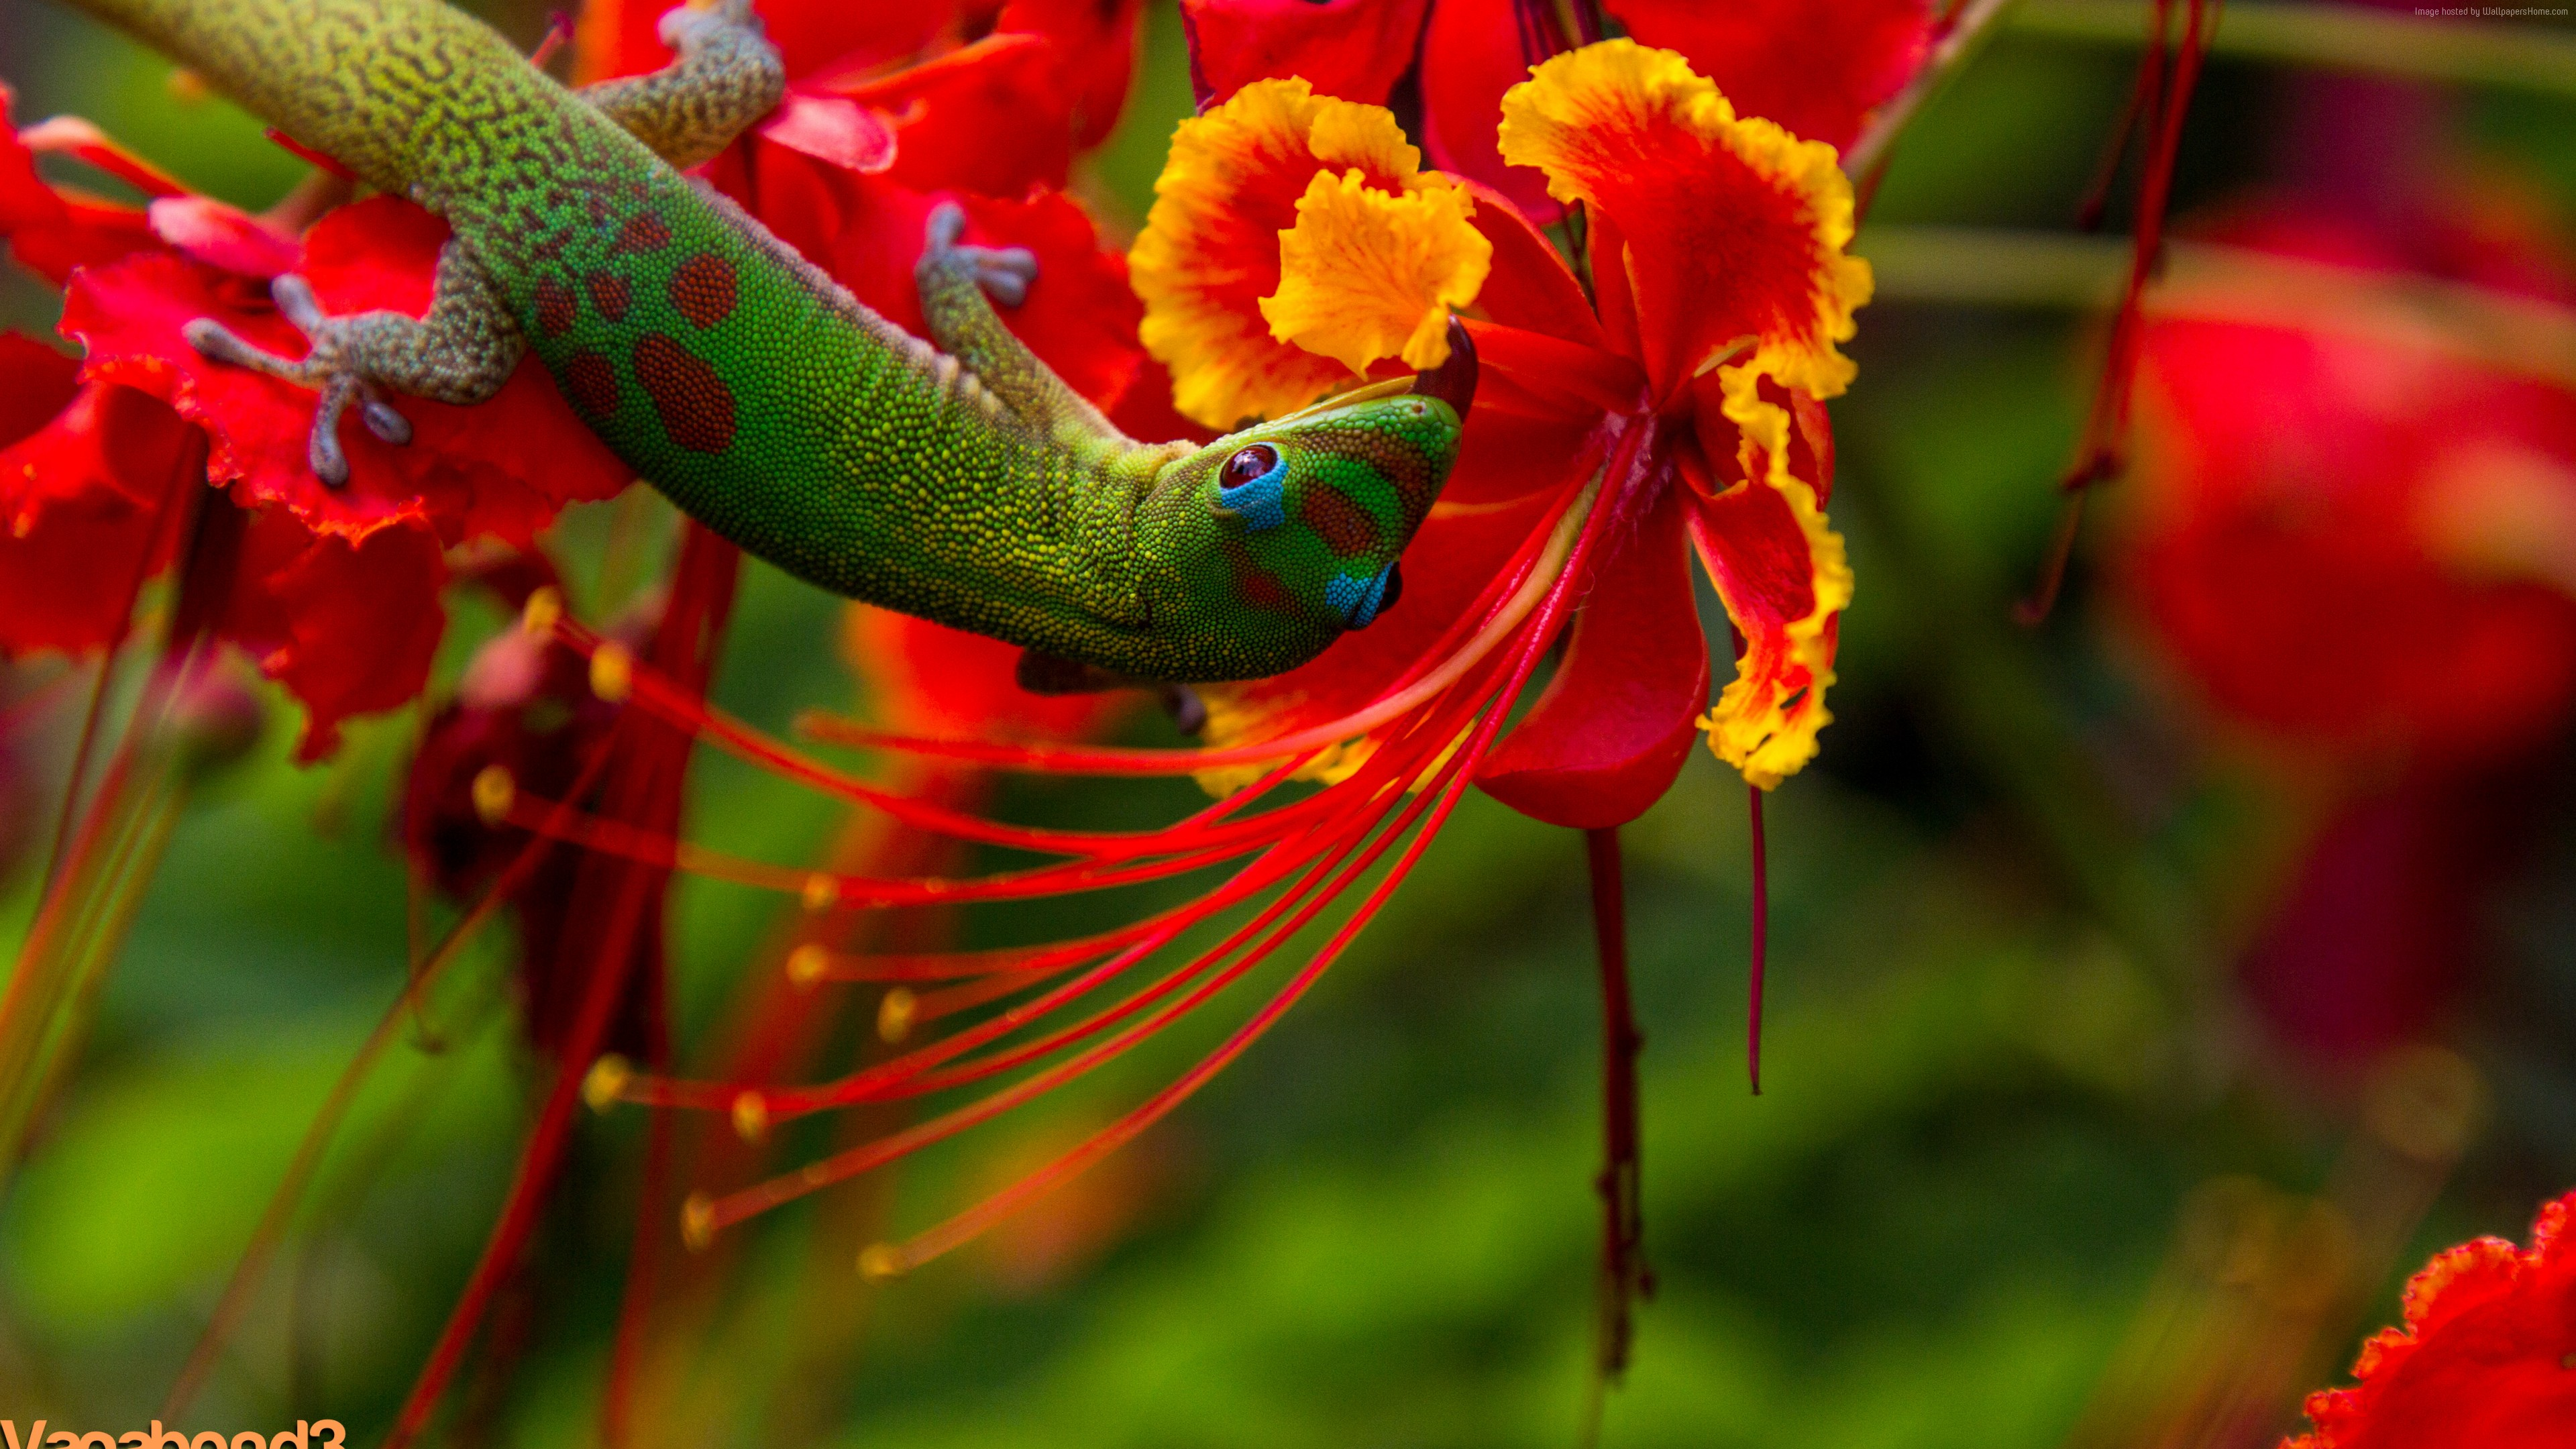 Wallpaper Lizard Hilo Hawaii Lizard Green Flowers Red